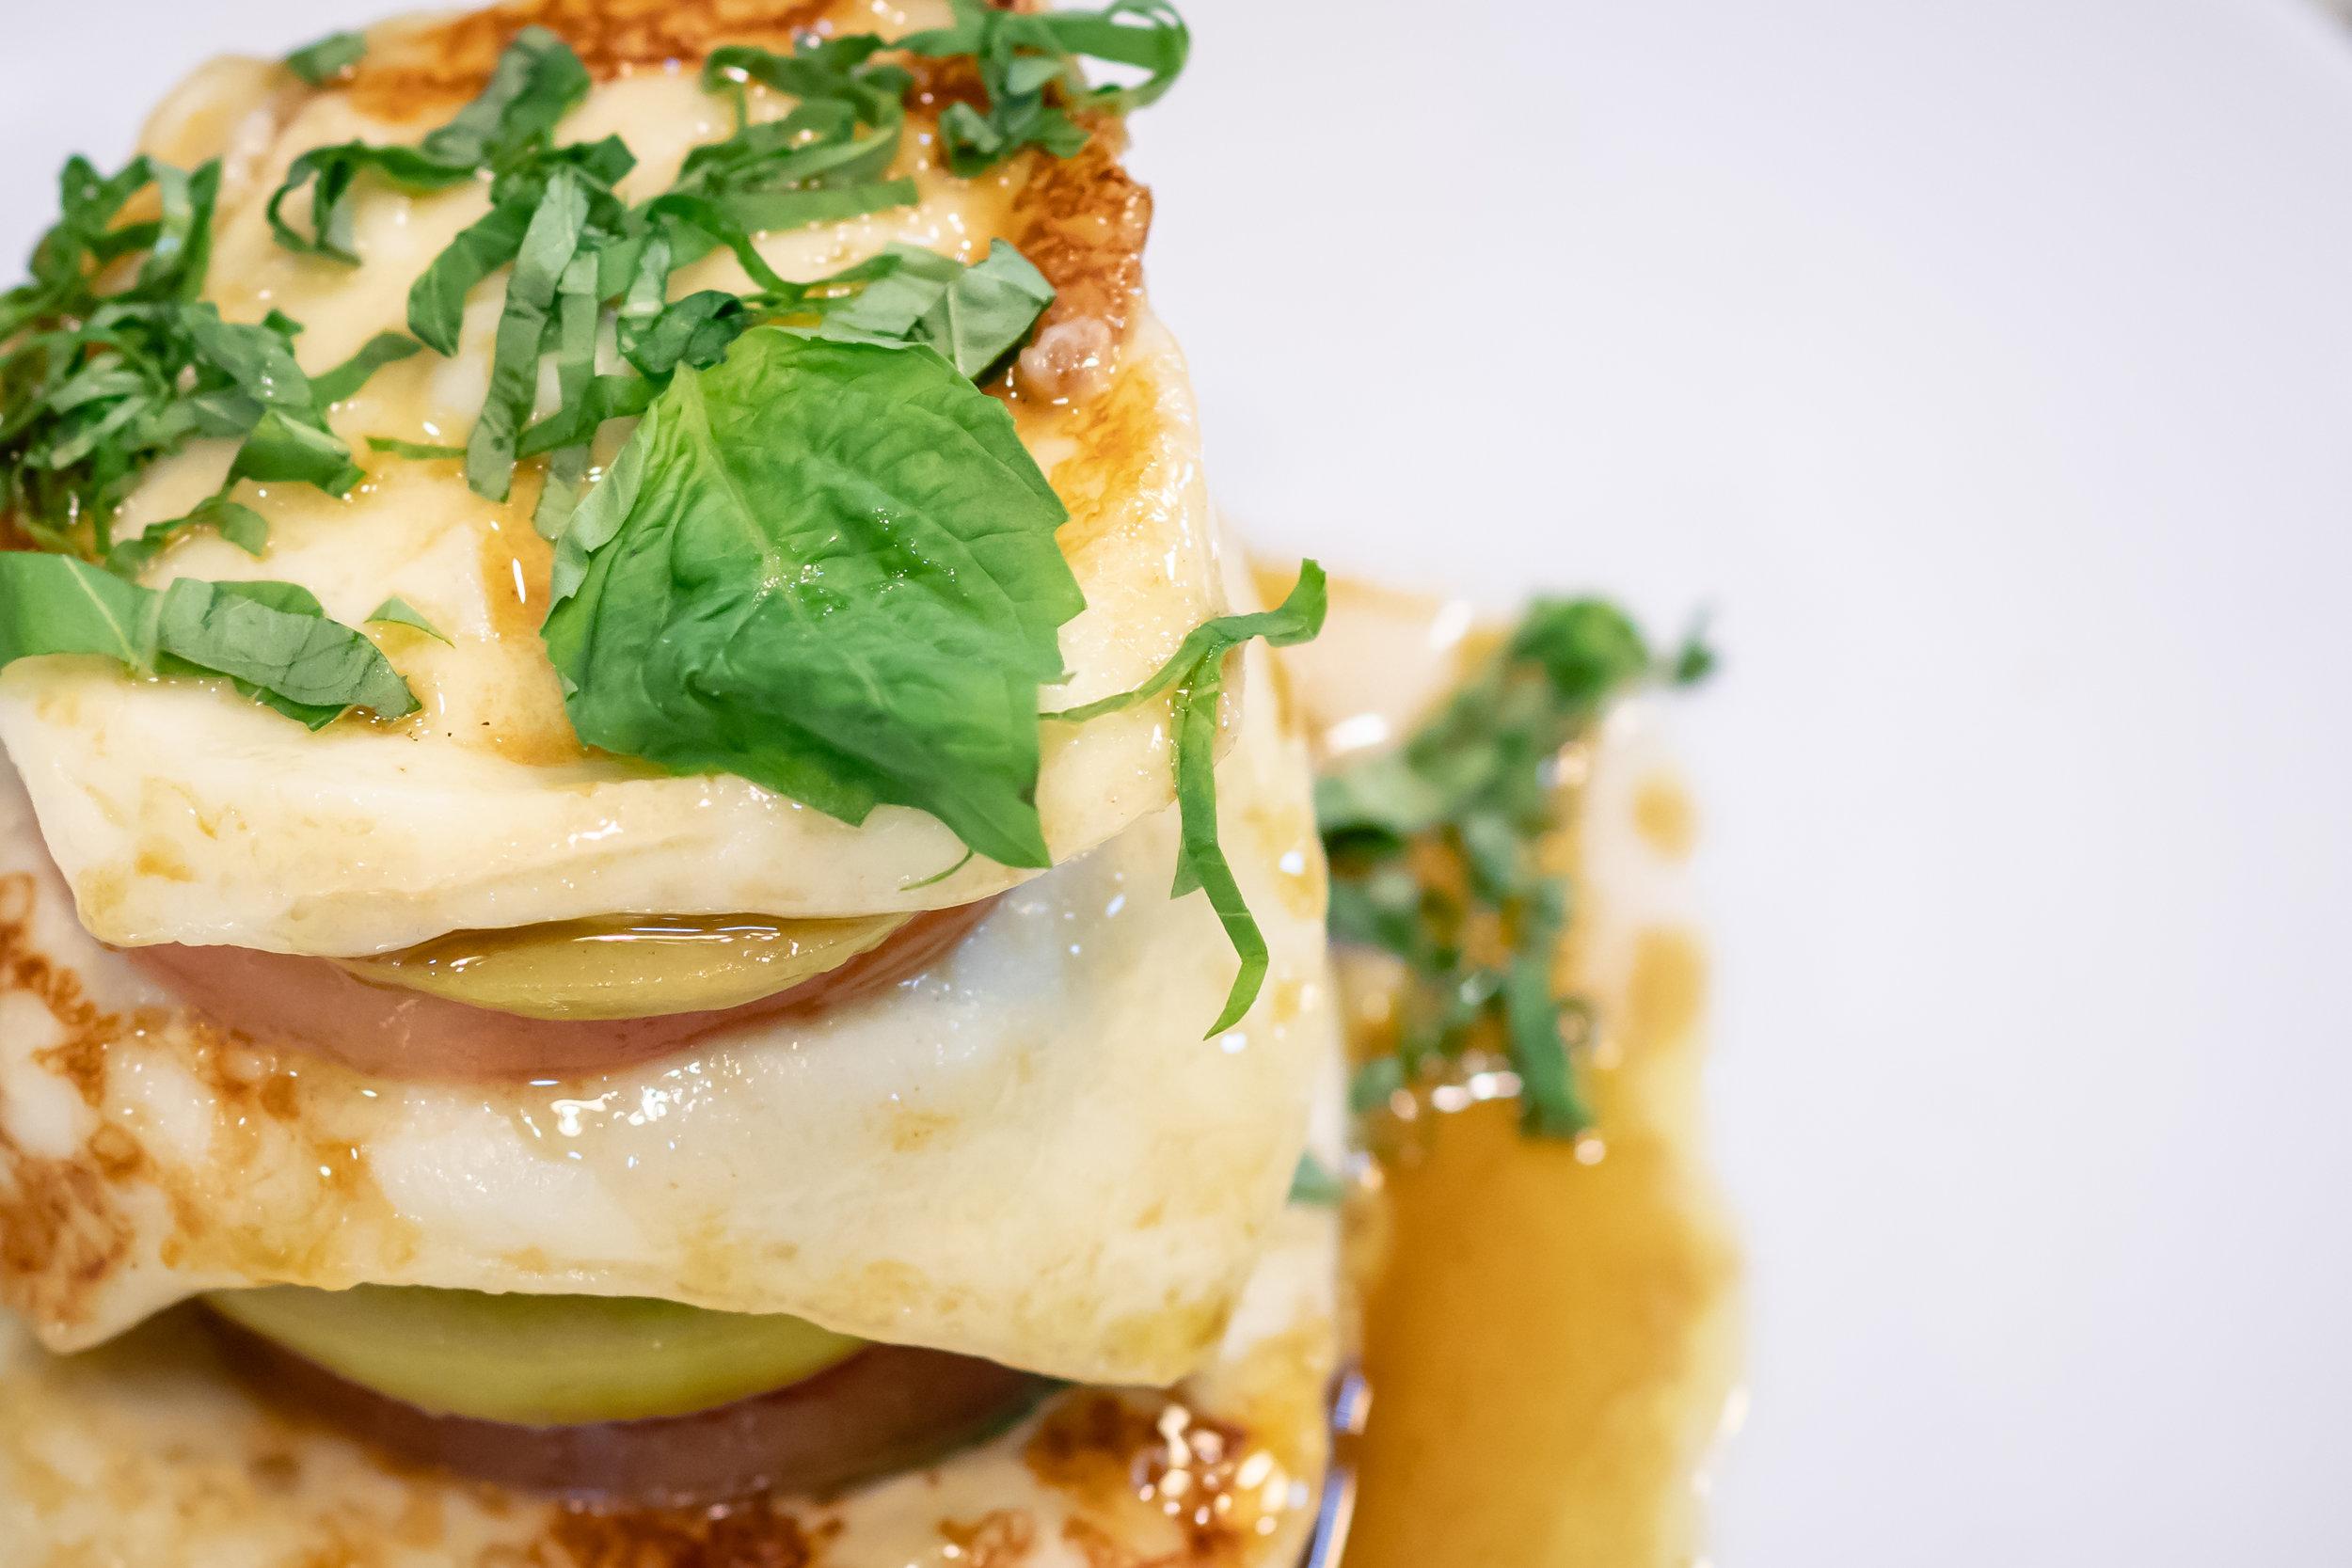 melon and mozzarella recipe by Chef Alex Gandia. Food photography by Yanitza Ninett Photography